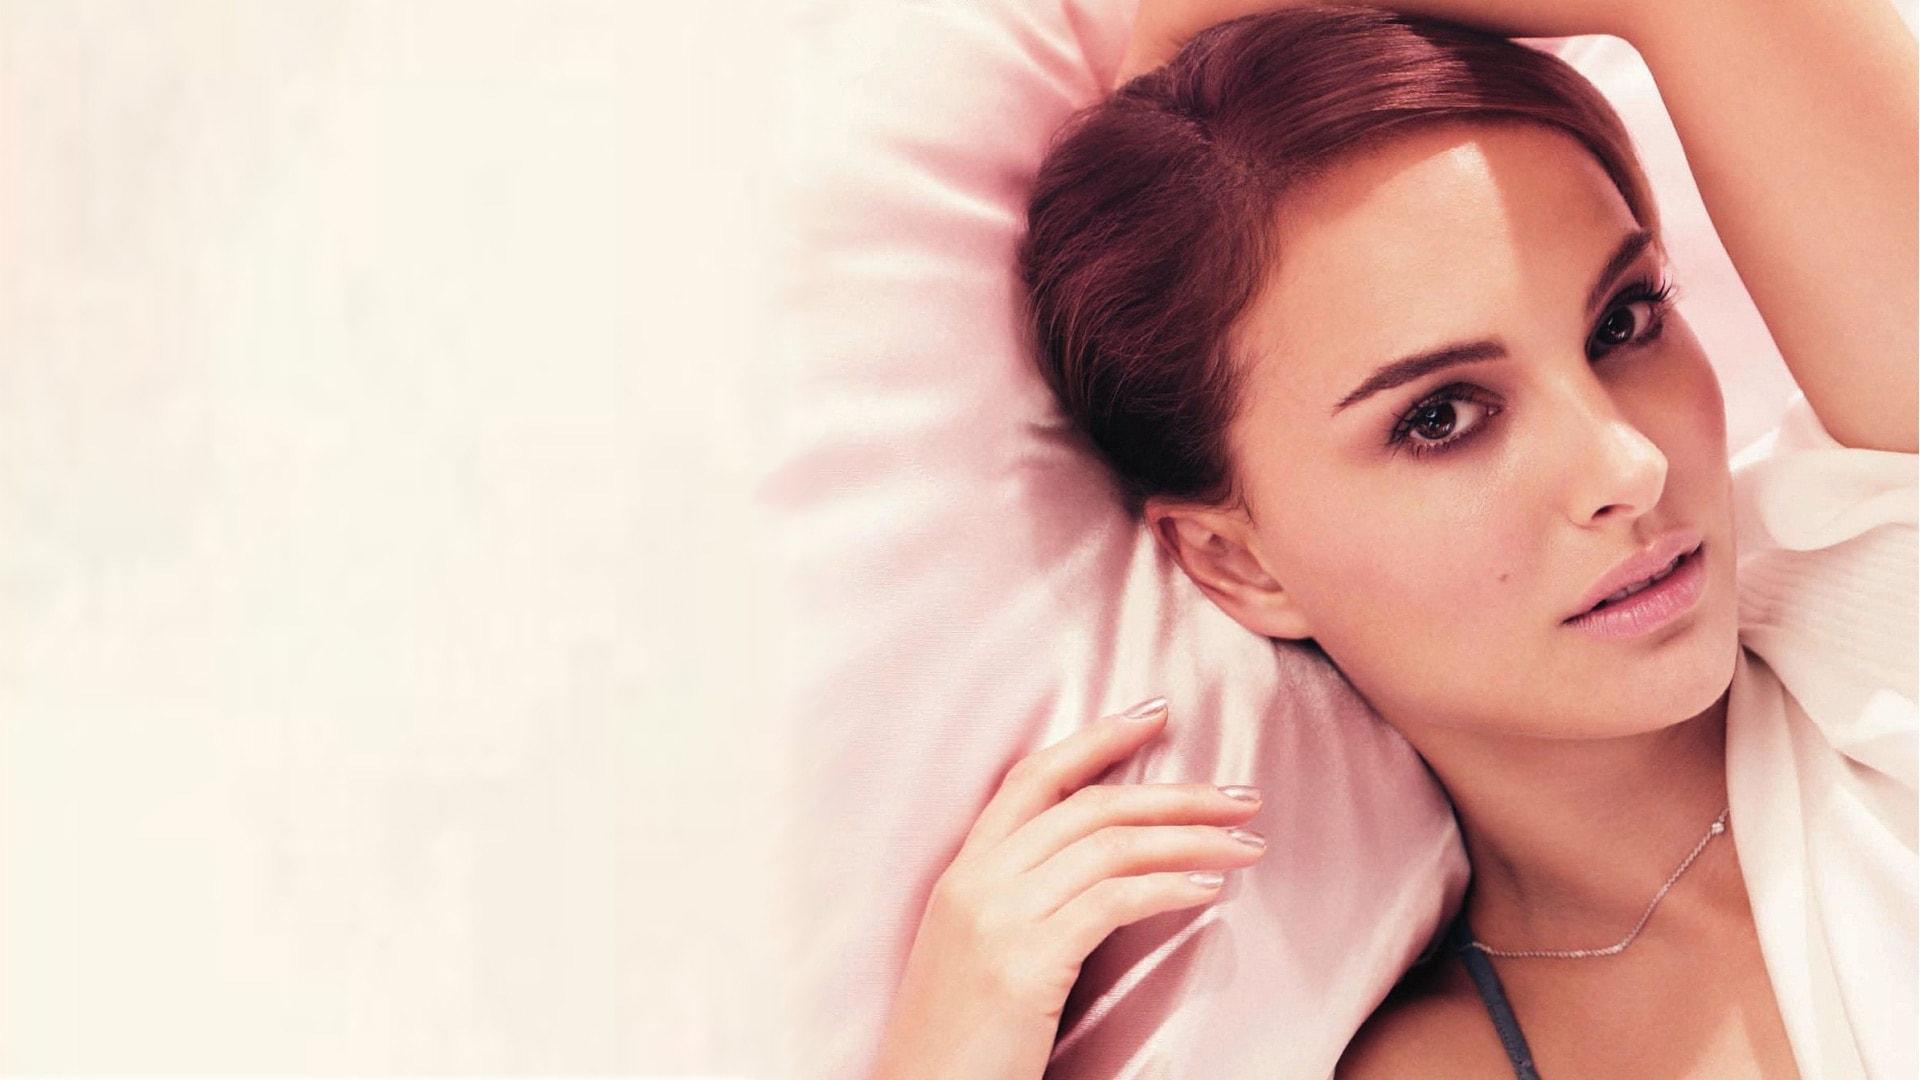 Natalie Portman full hd wallpapers